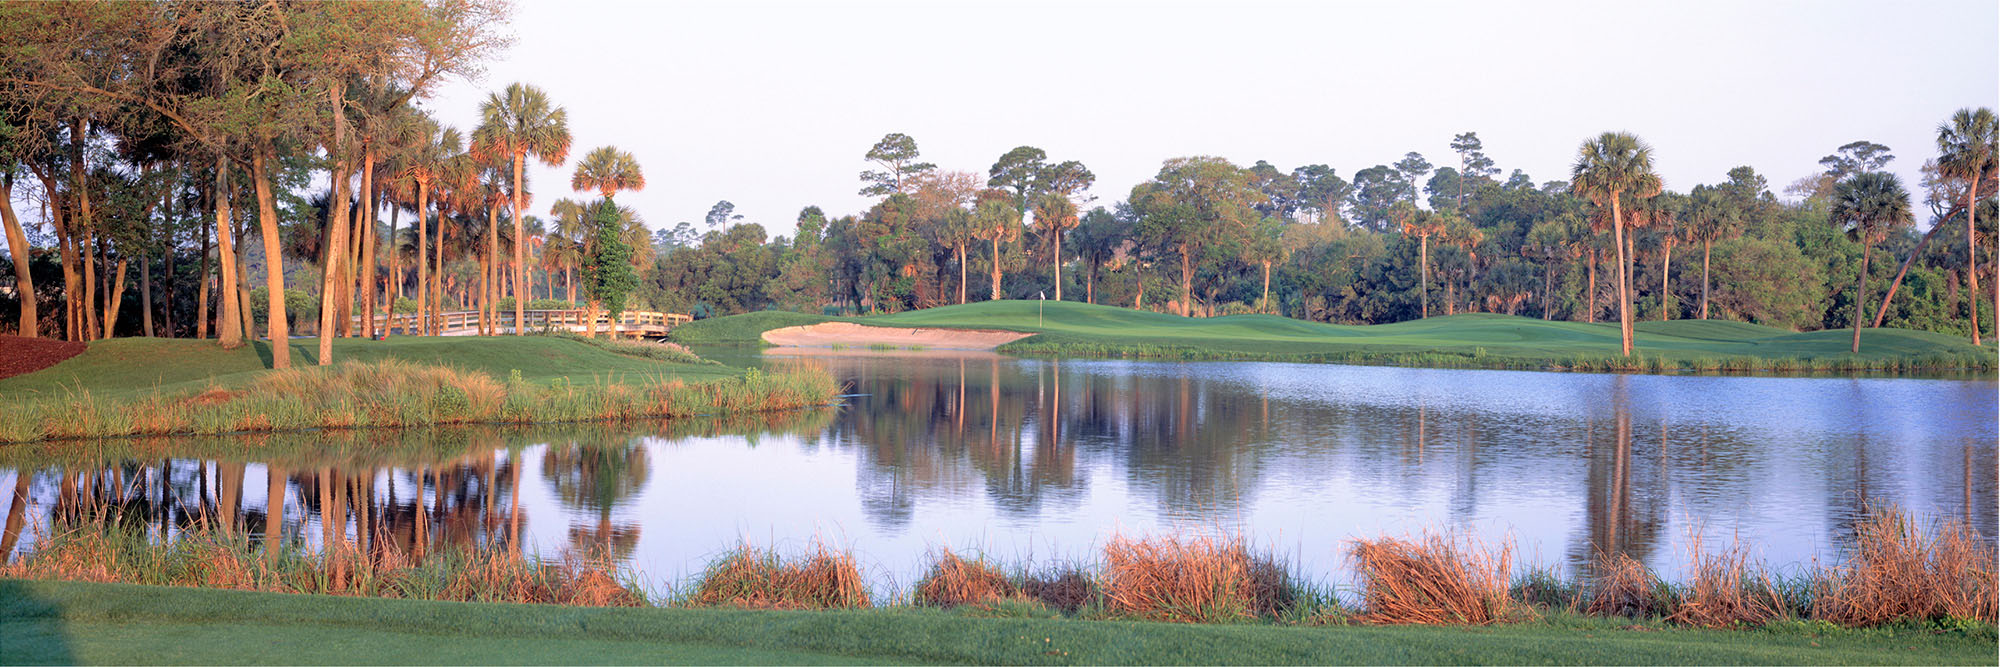 Golf Course Image - Kiawah Osprey Point No. 11